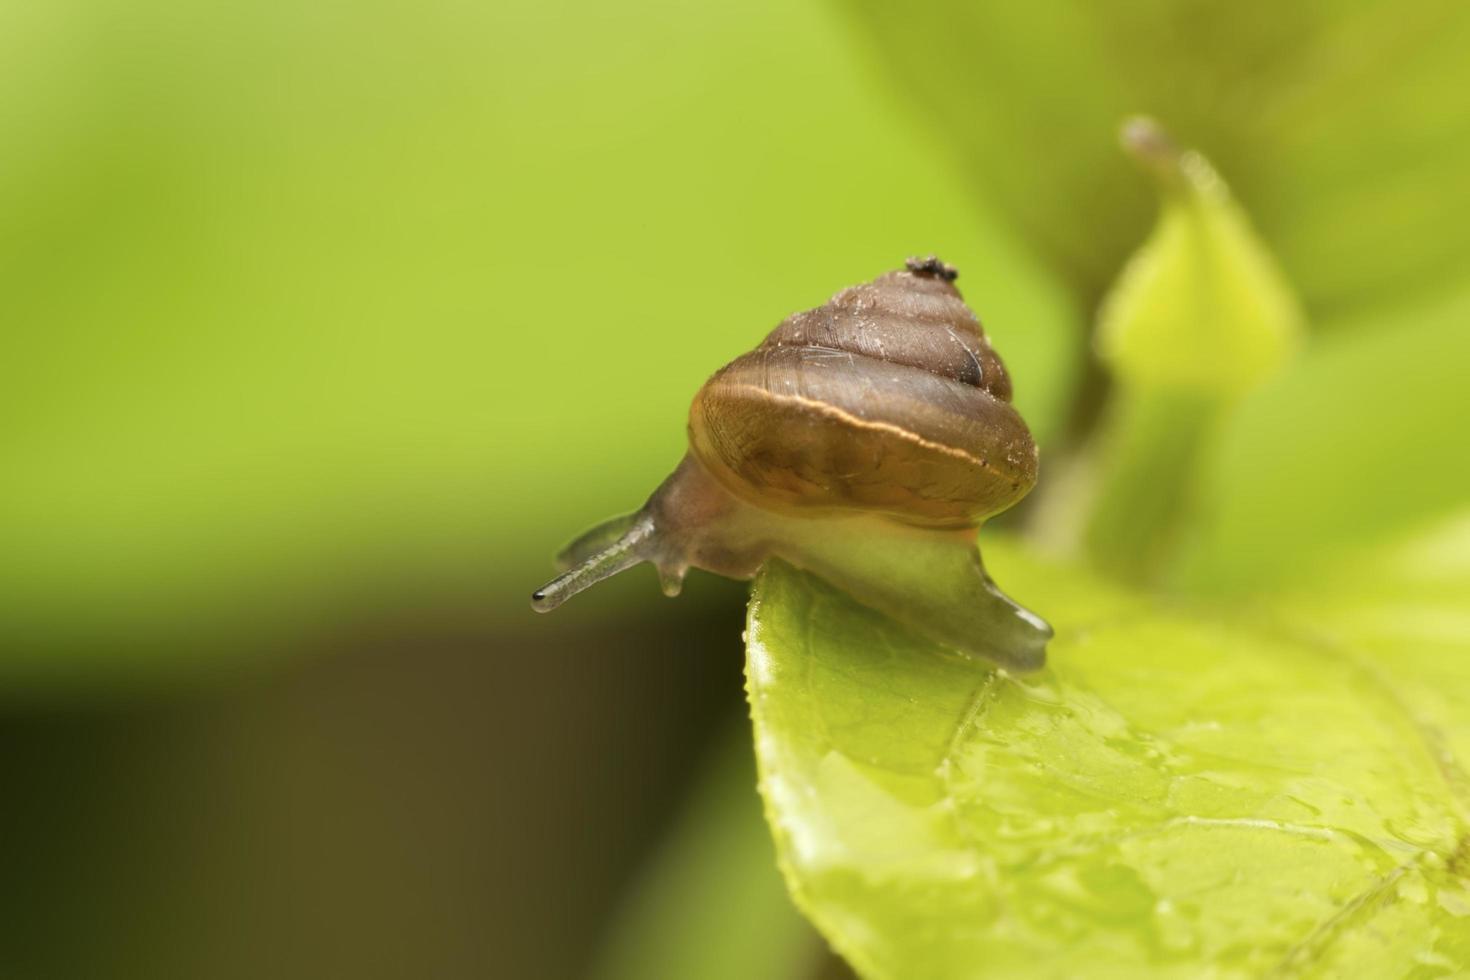 escargot sur feuille verte photo